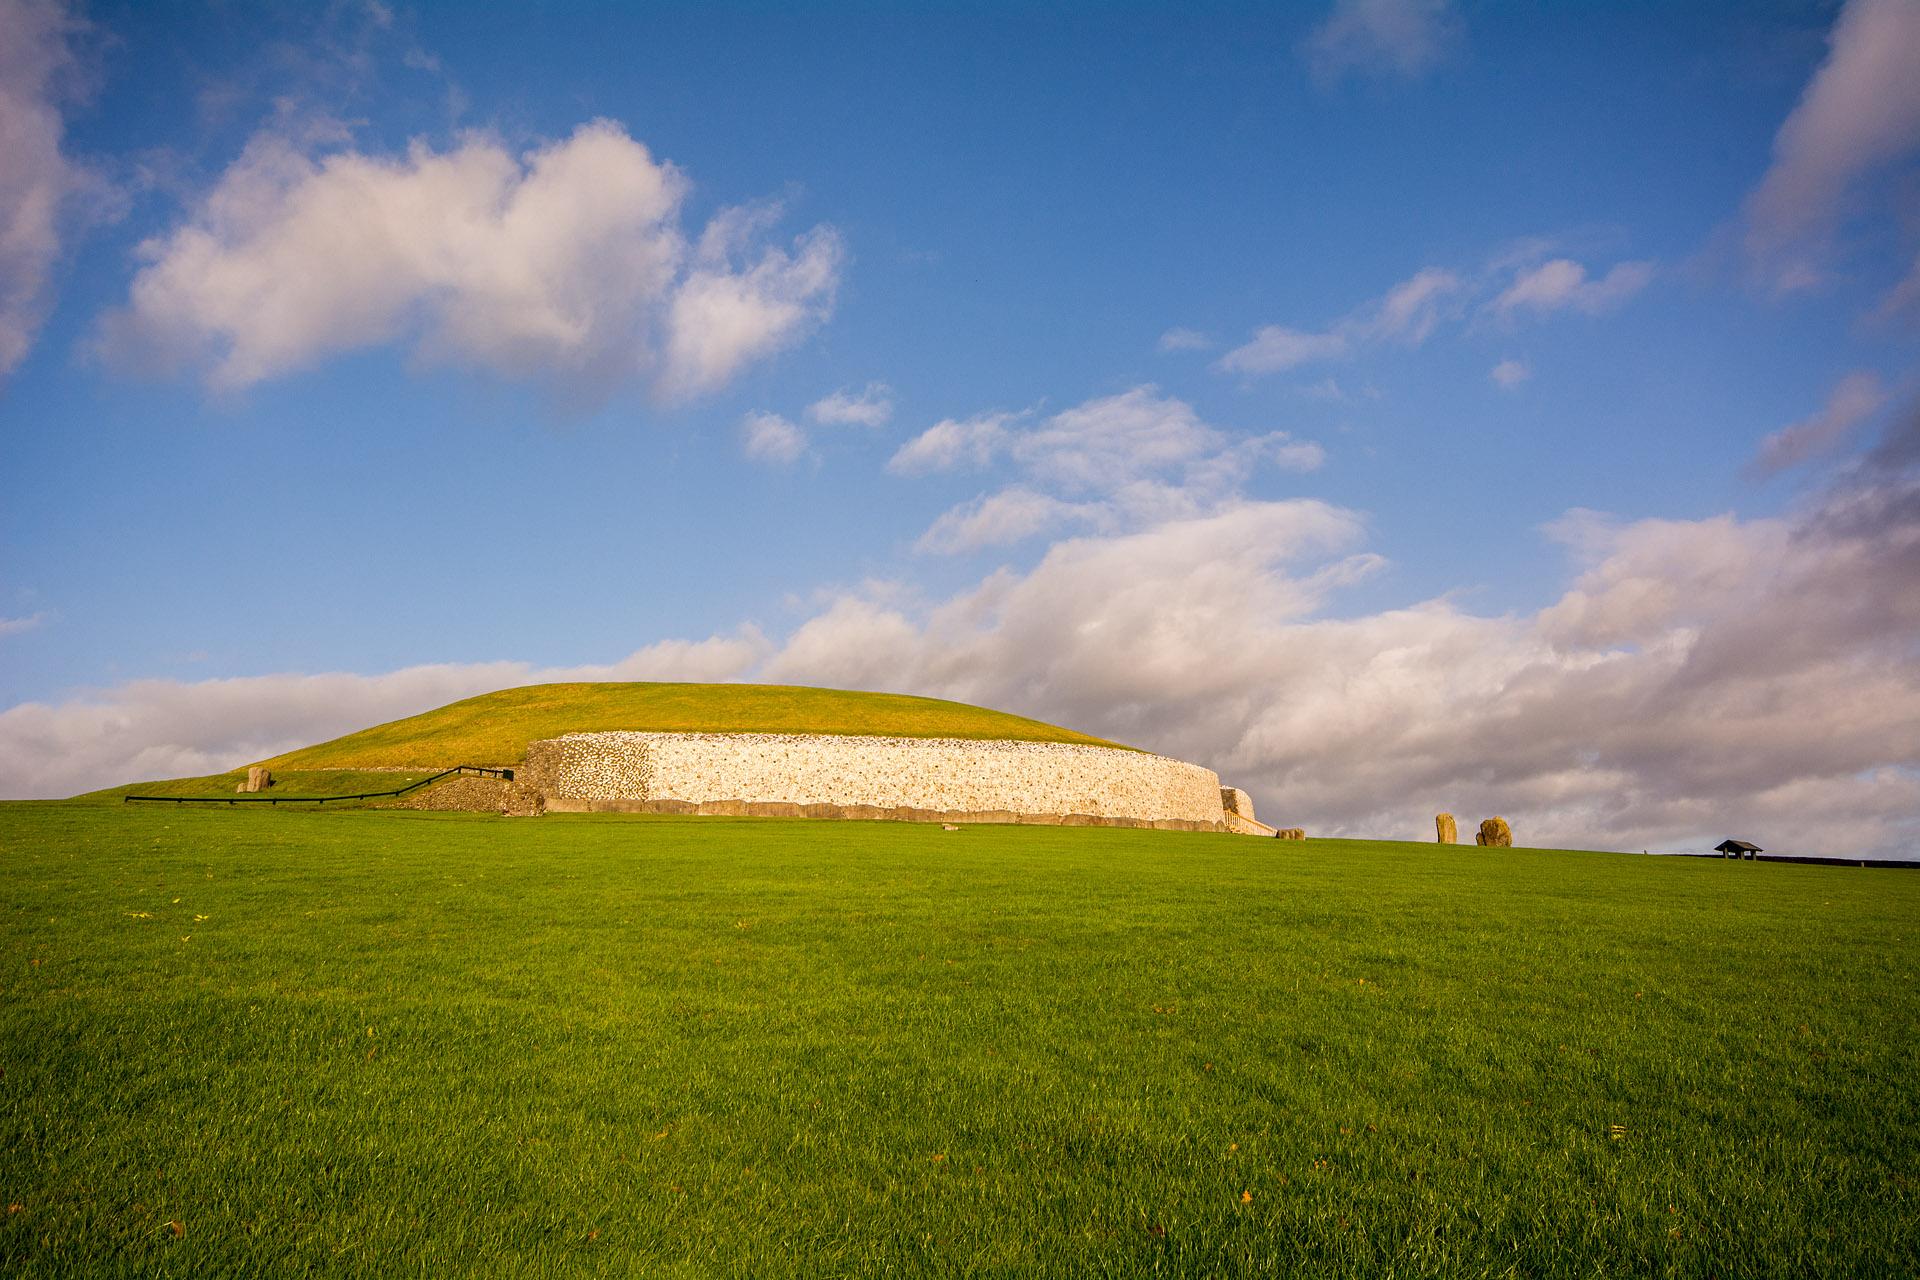 Newgrange (Neolithic passage tomb)